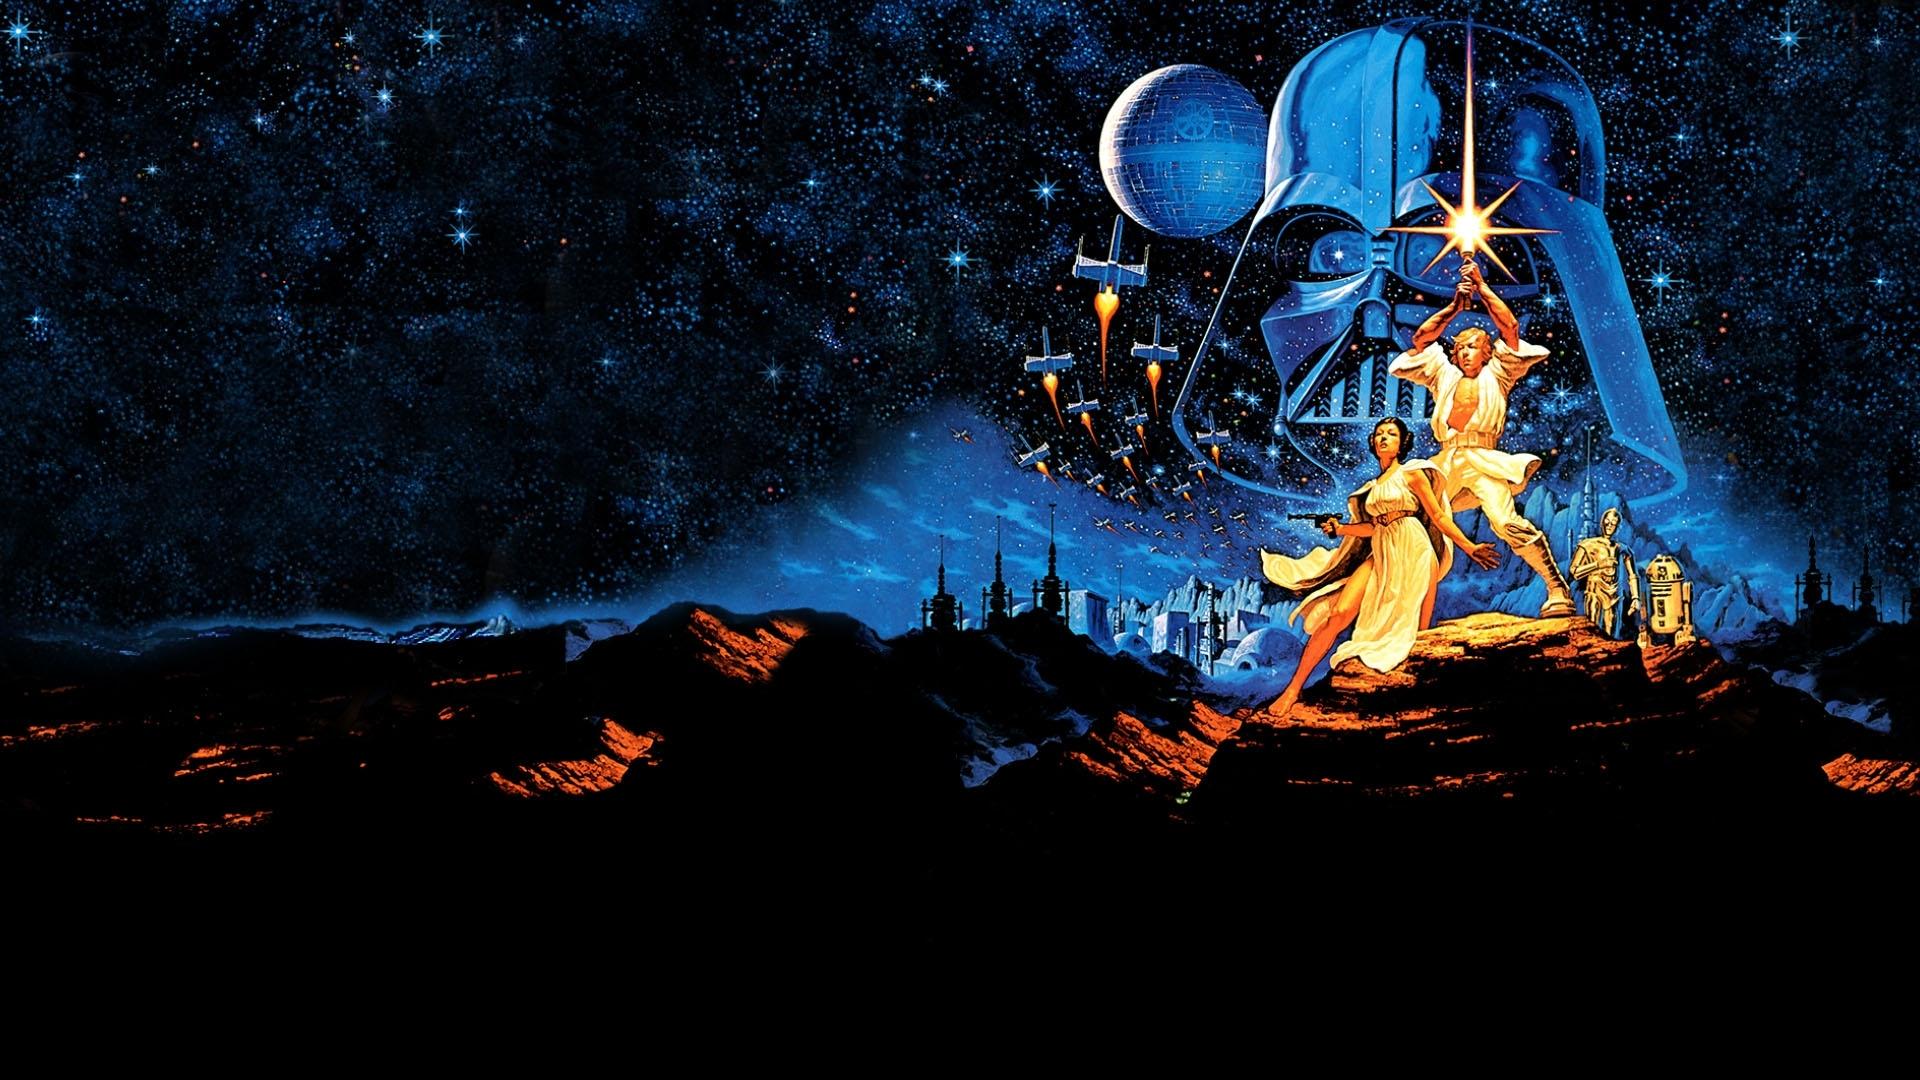 fonds d'écran star wars - star wars wallpapers